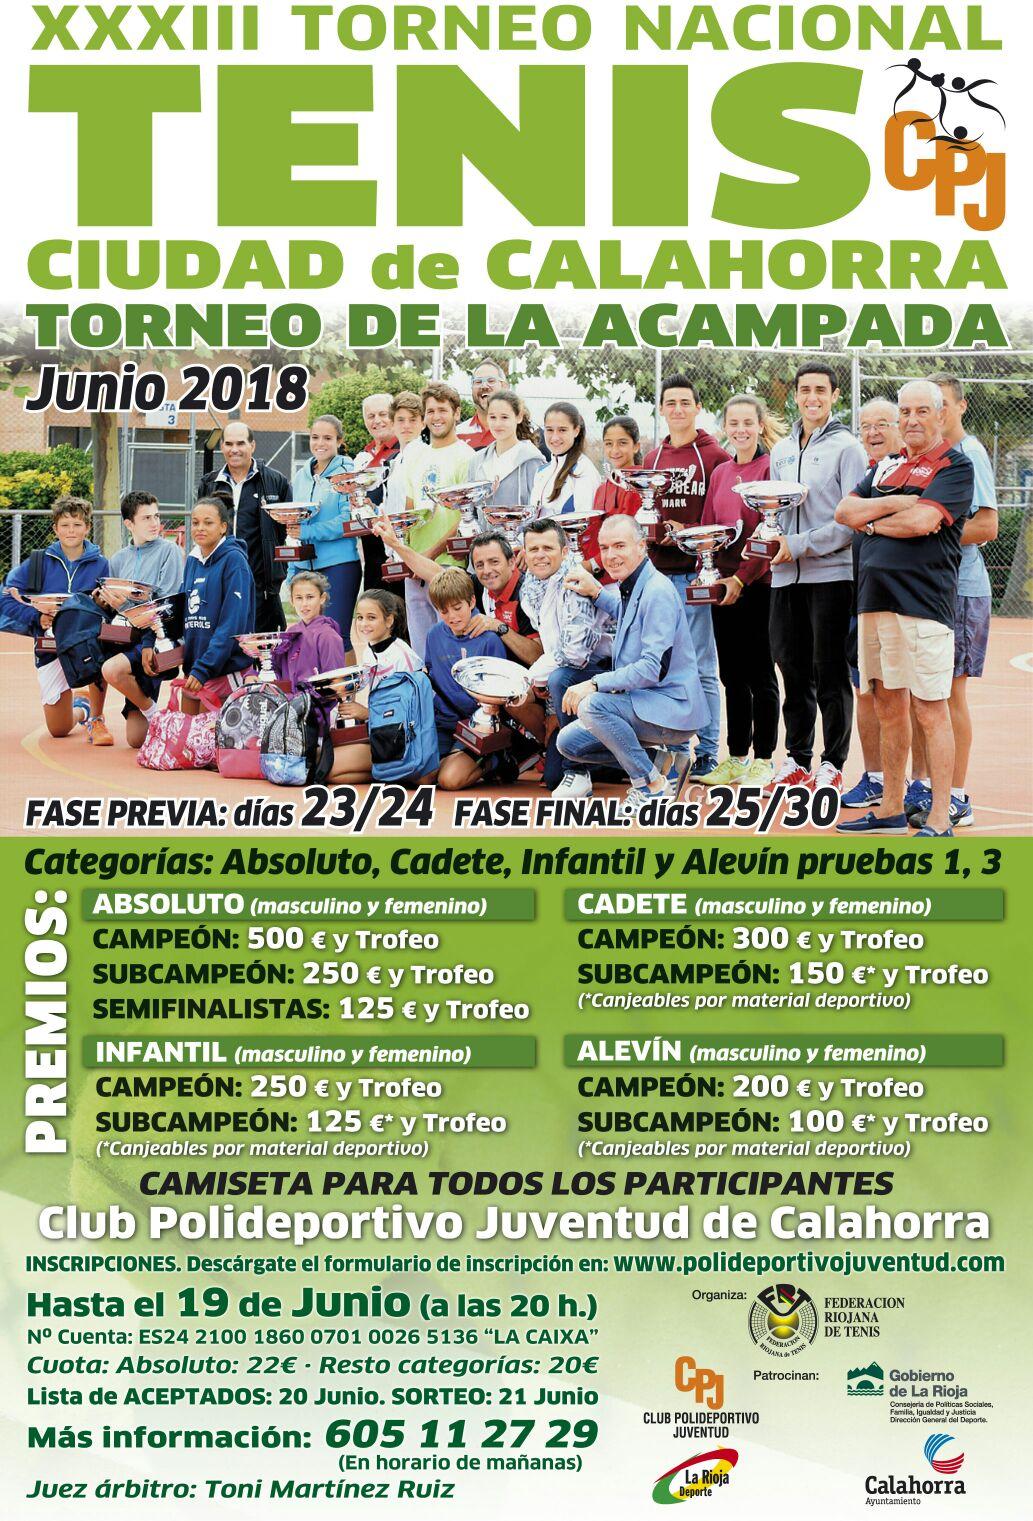 XXX III TORNEO CIUDAD DE CALAHORRA